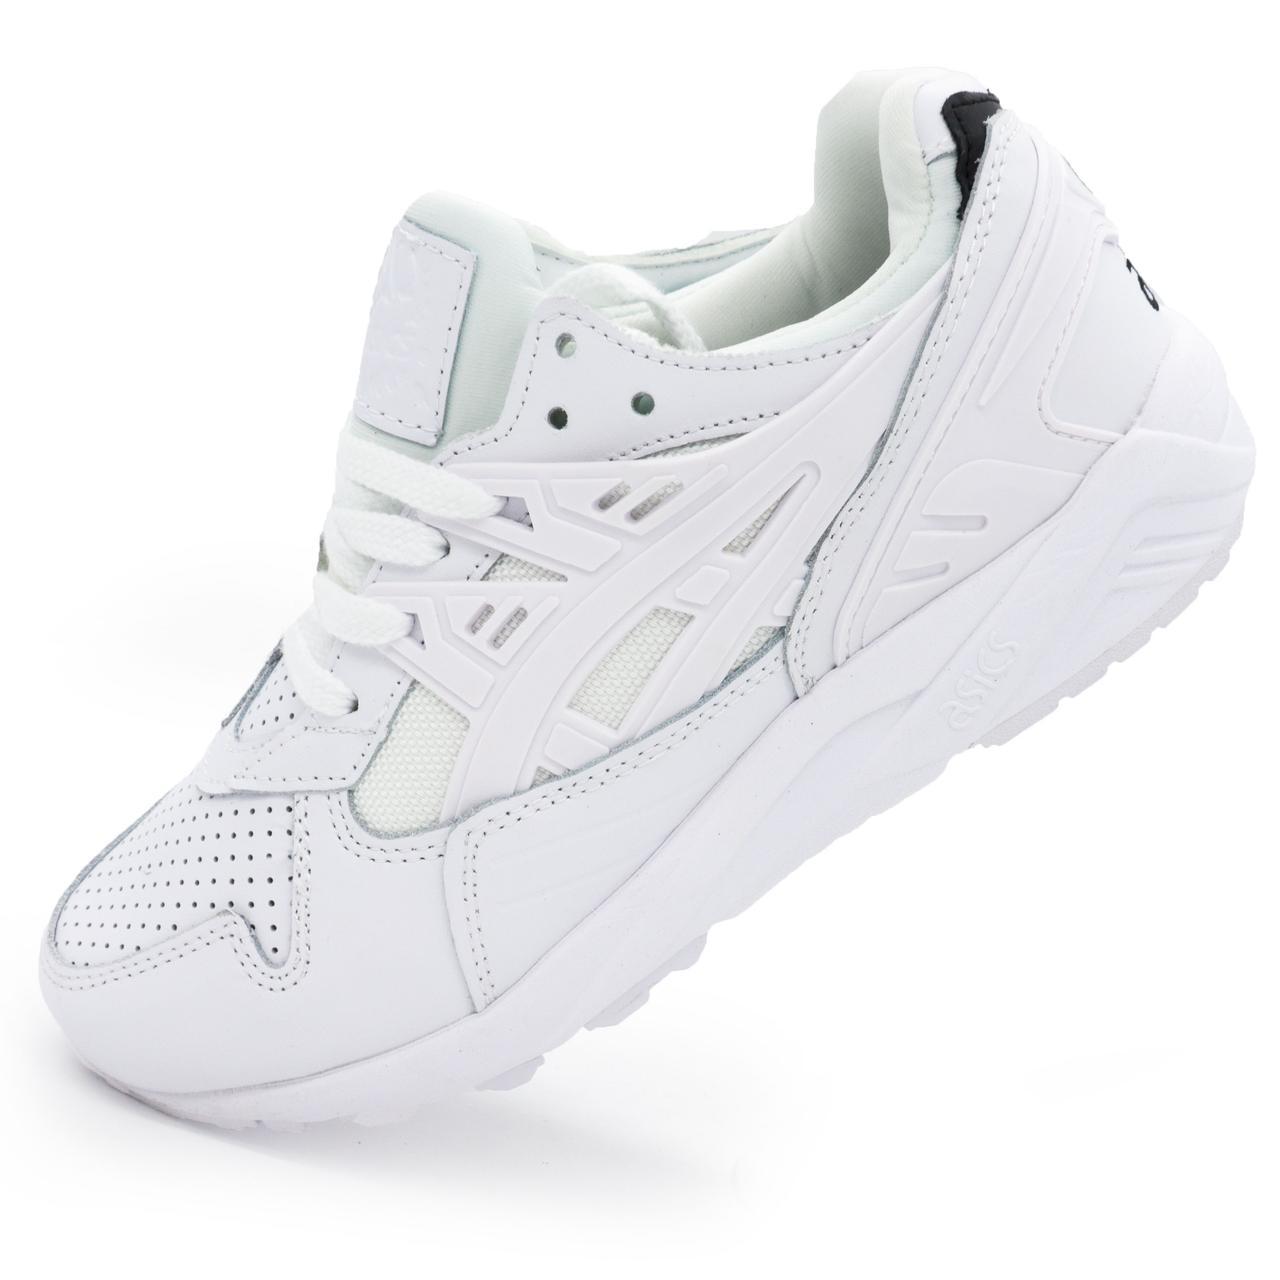 3e848933aa37 Белые женские кроссовки Асикс Asics Gel натуральная кожа р.(36, 37 ...